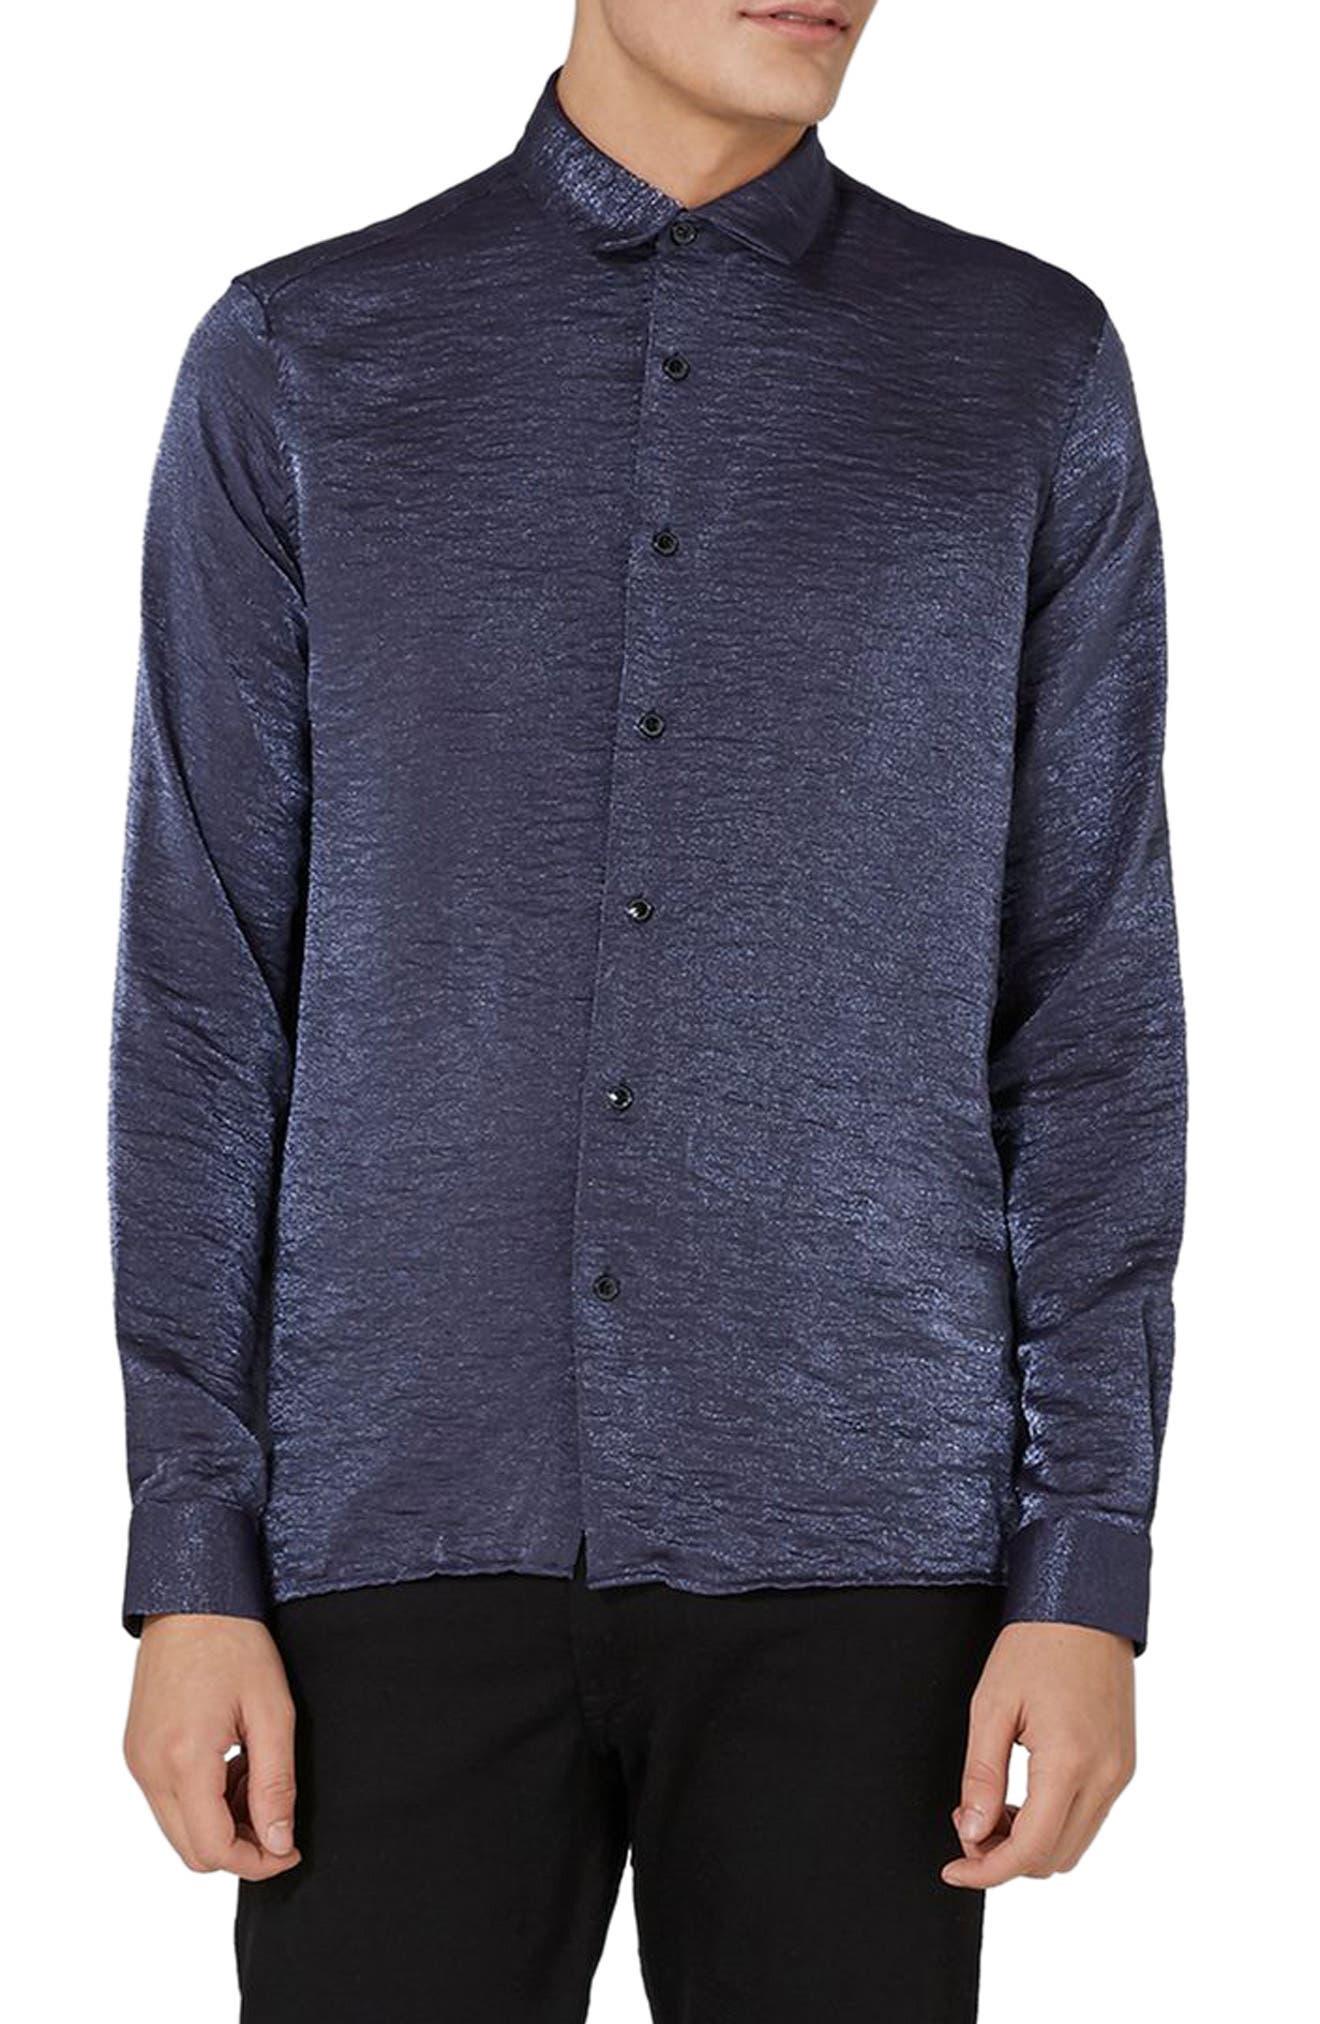 Main Image - Topman Classic Fit Glitter Shirt